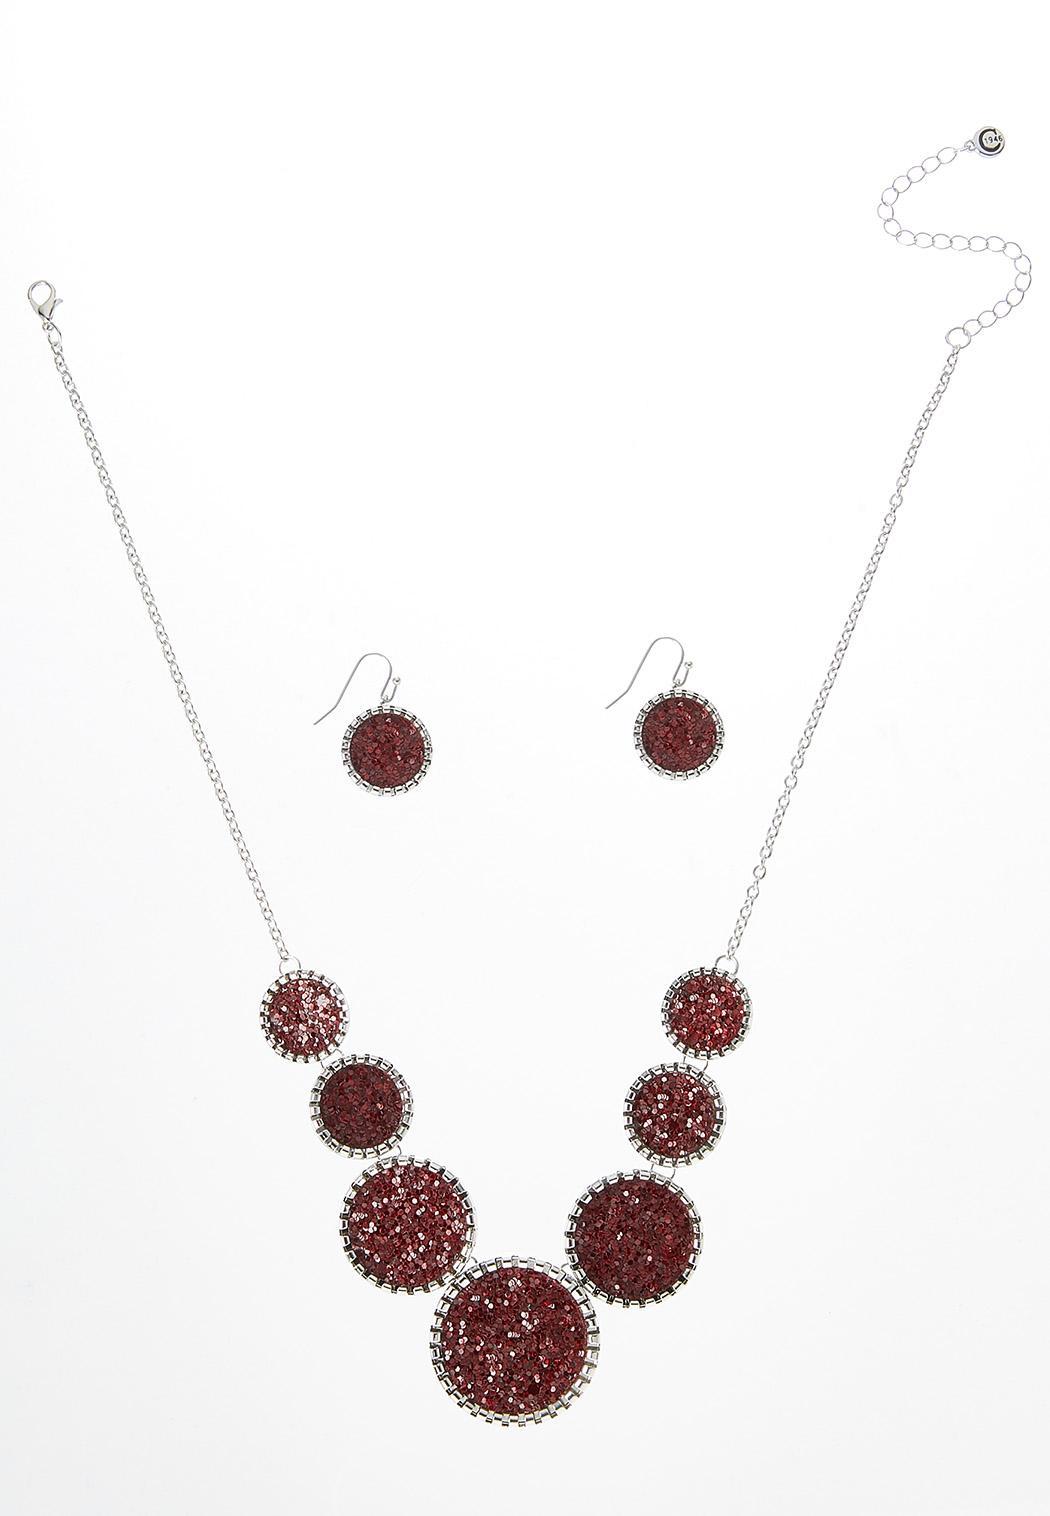 Glitter Necklace Earring Set